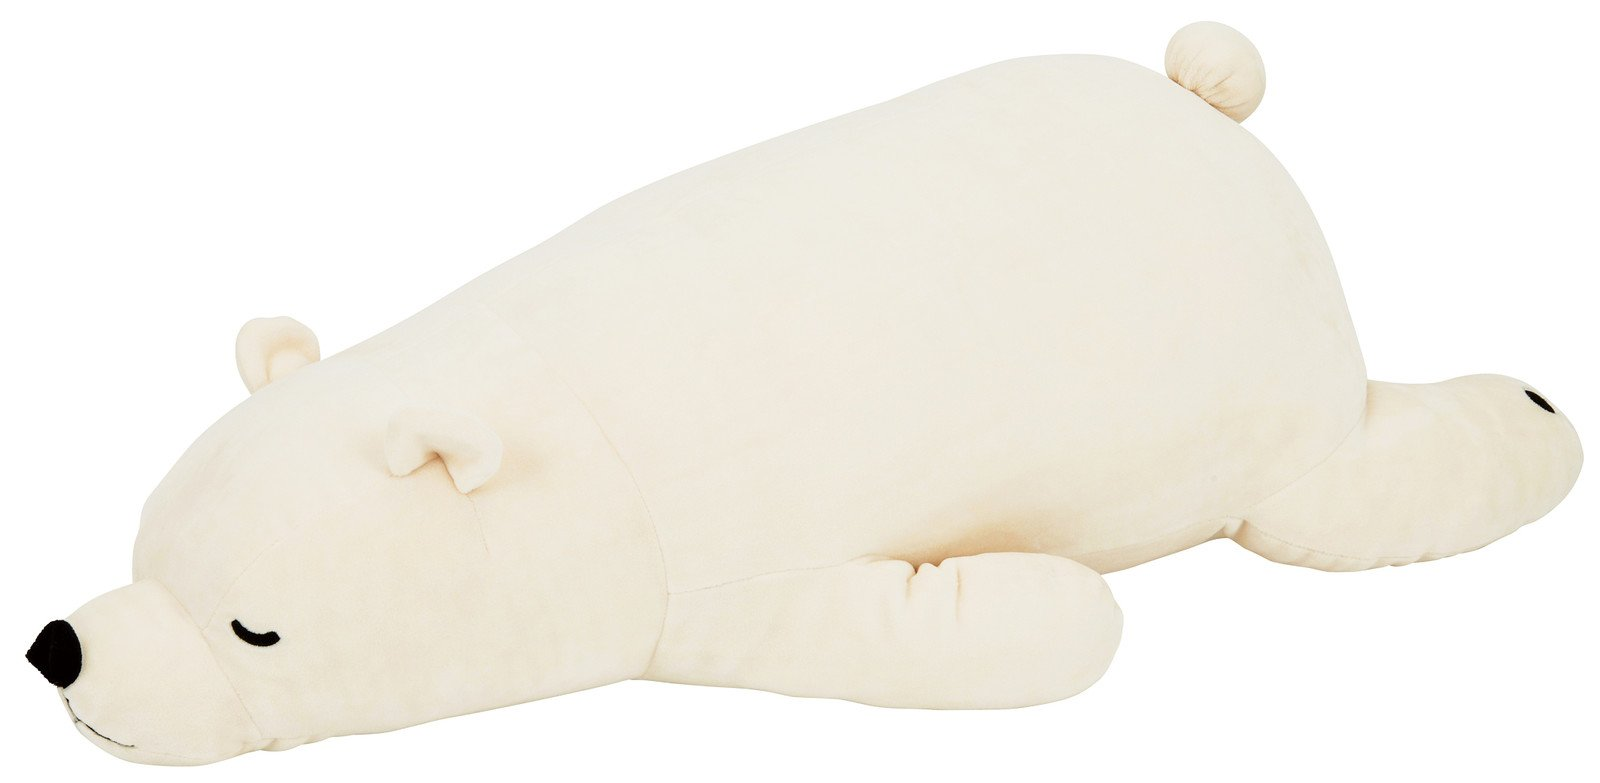 Livheart Premium Nemu Nemu Sleepy head Animals Body Pillow White Plush Polar Bear 'Lucky' size M (21''x9.5''x5.5'') Japan import 28976-11 Huggable Super Soft Stuffed Toy by Livheart (Image #1)